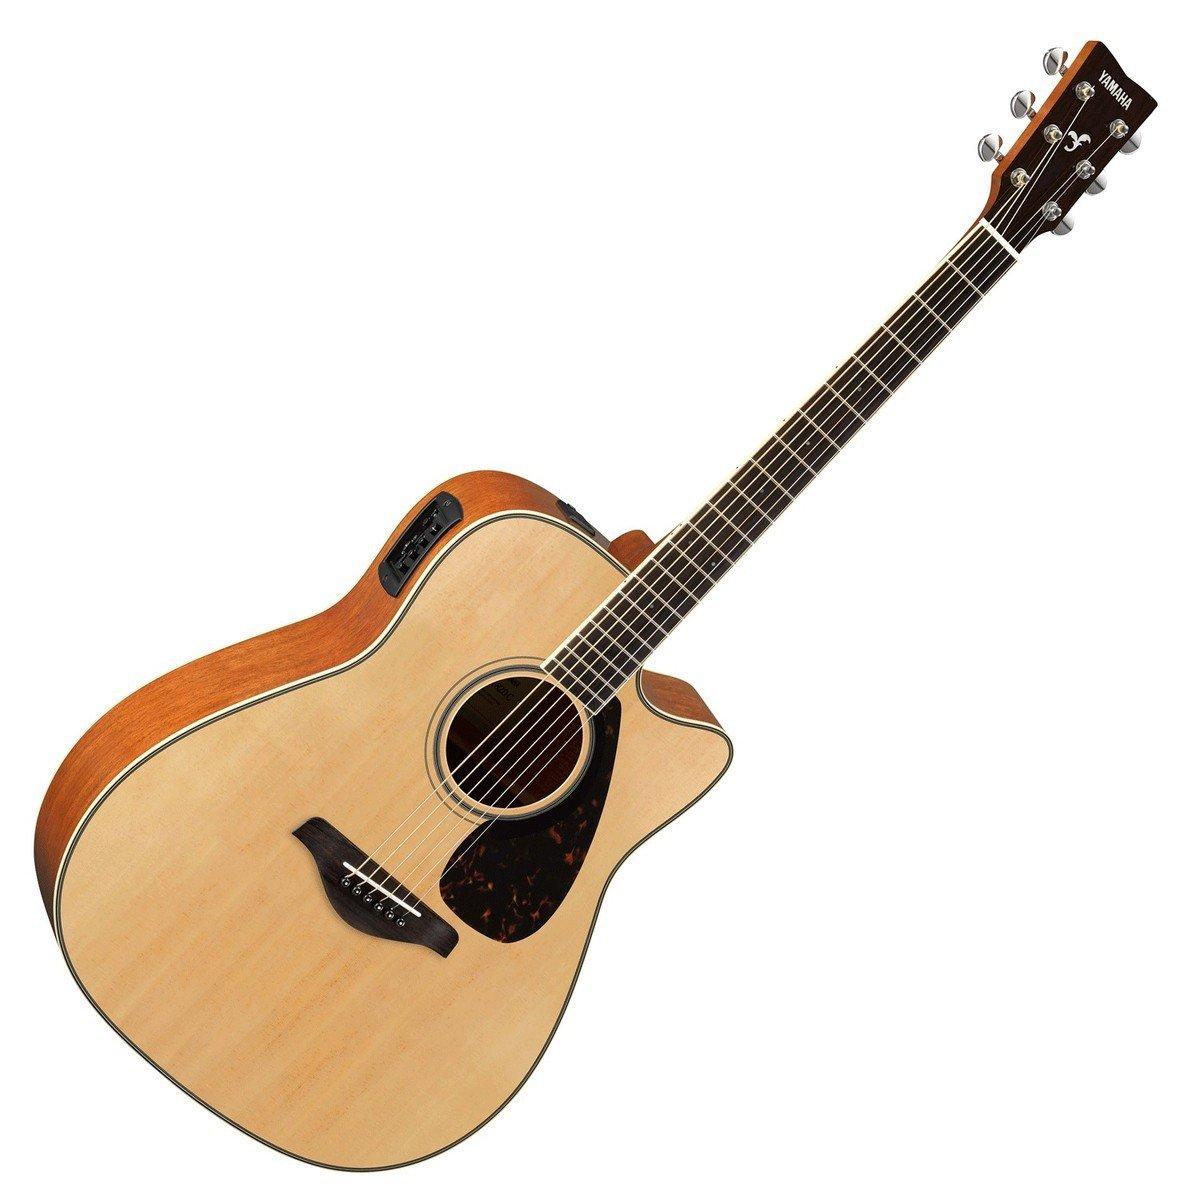 Yamaha FGX820C NATURAL Yamaha Folk Guitar